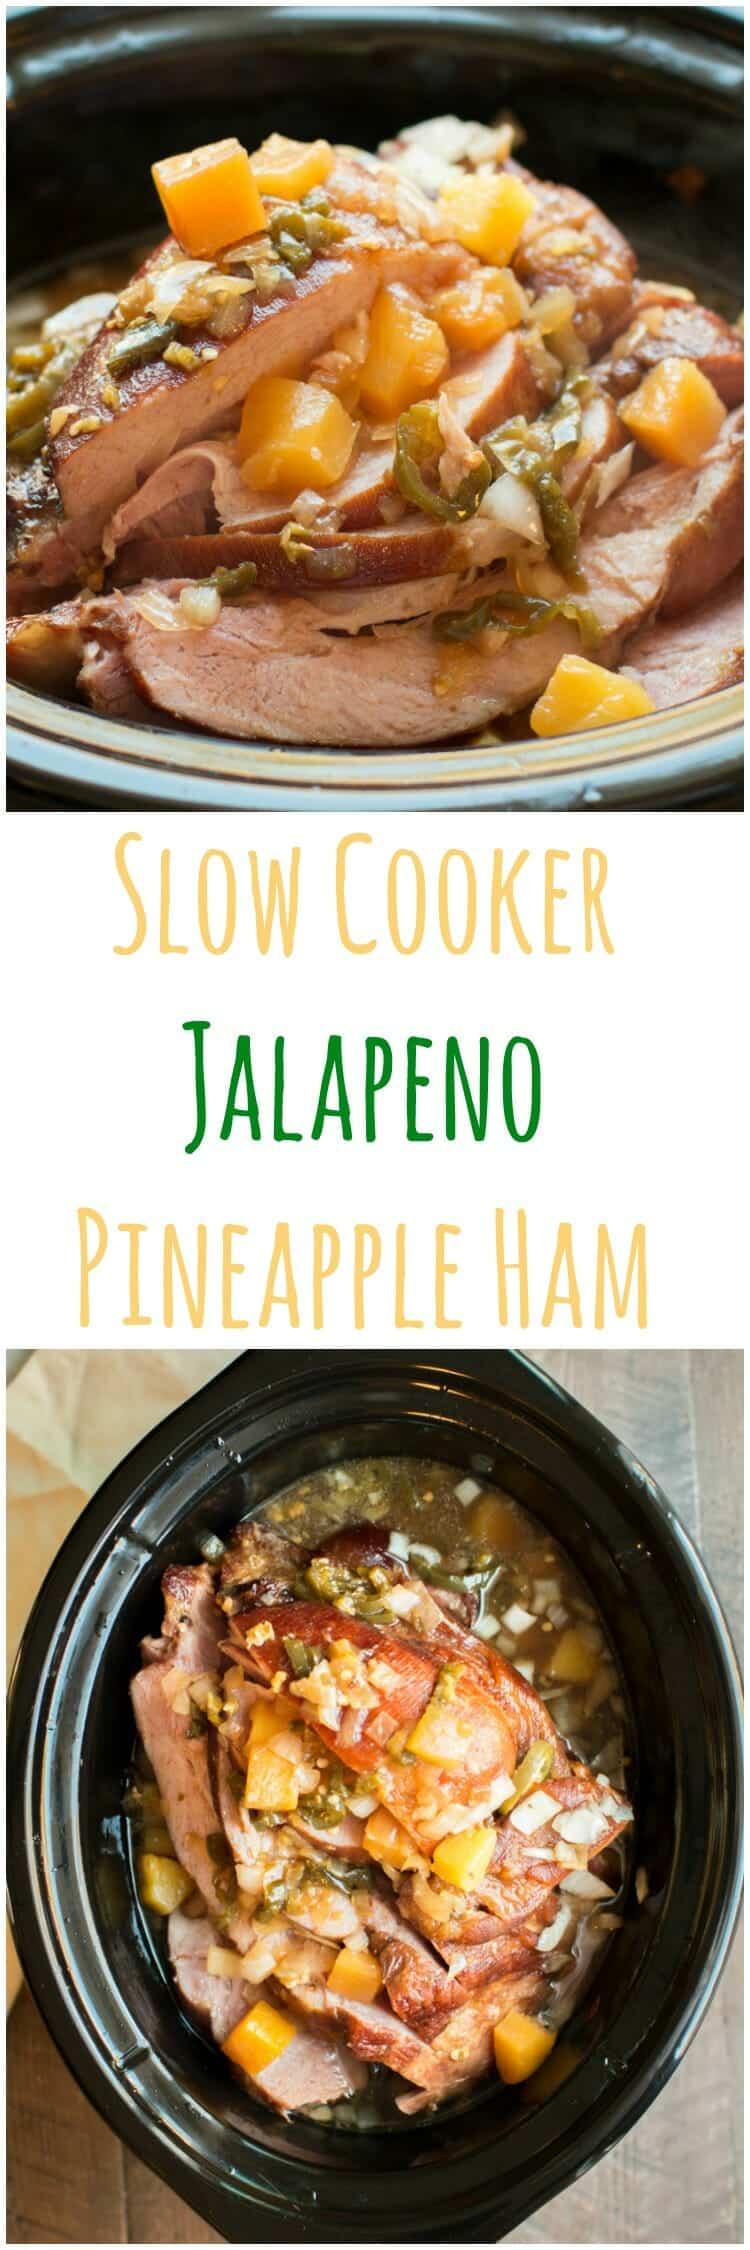 Slow Cooker Jalapeno Ham